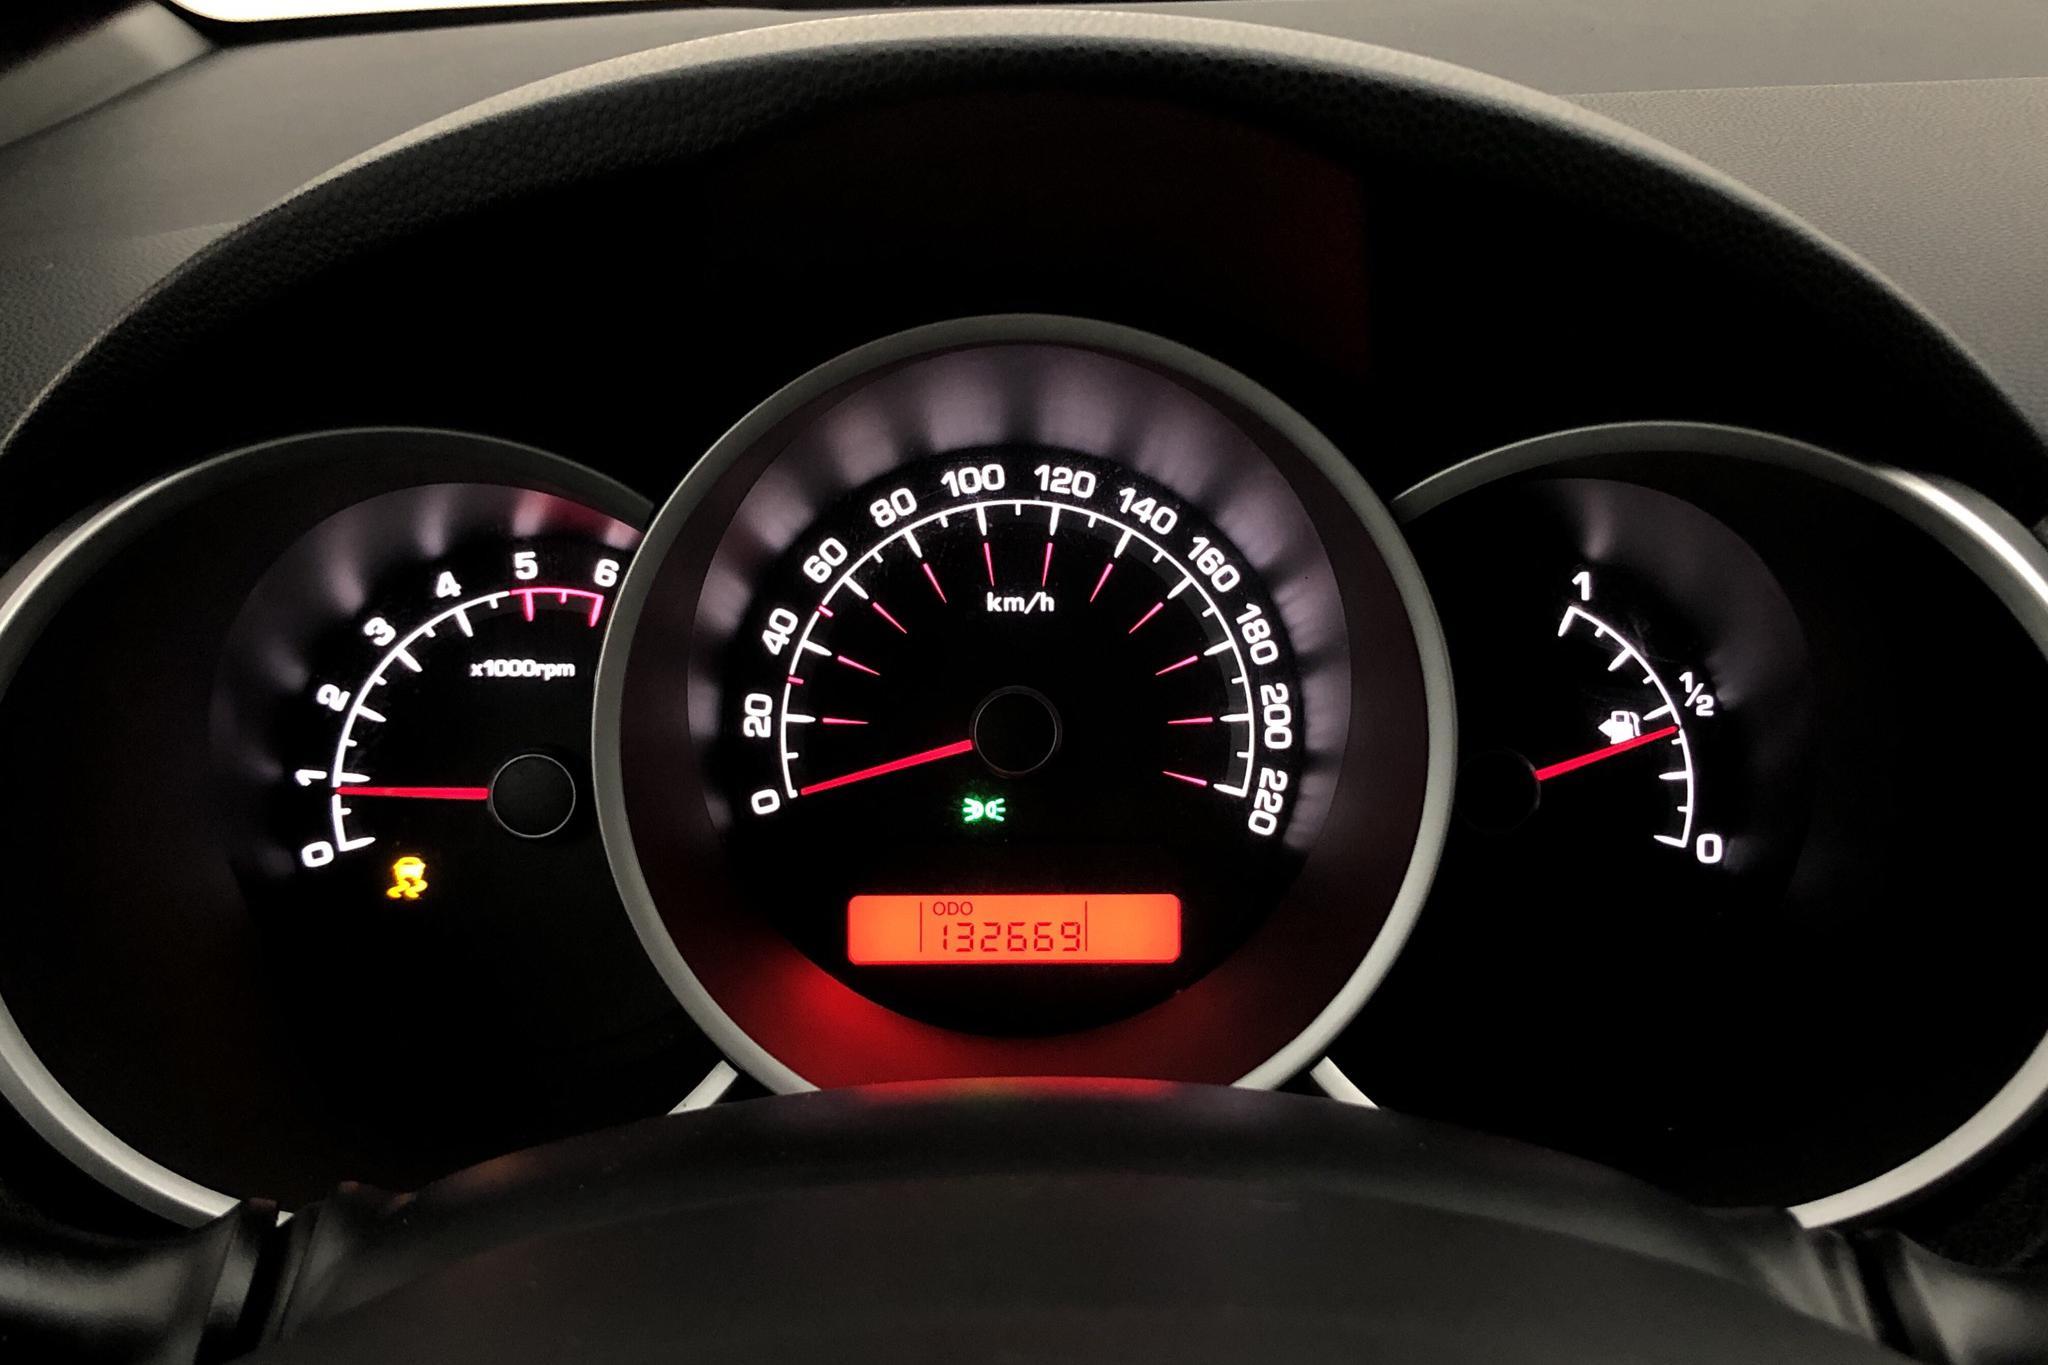 KIA Venga 1.4 CRDi (90hk) - 13 266 mil - Manuell - grå - 2011